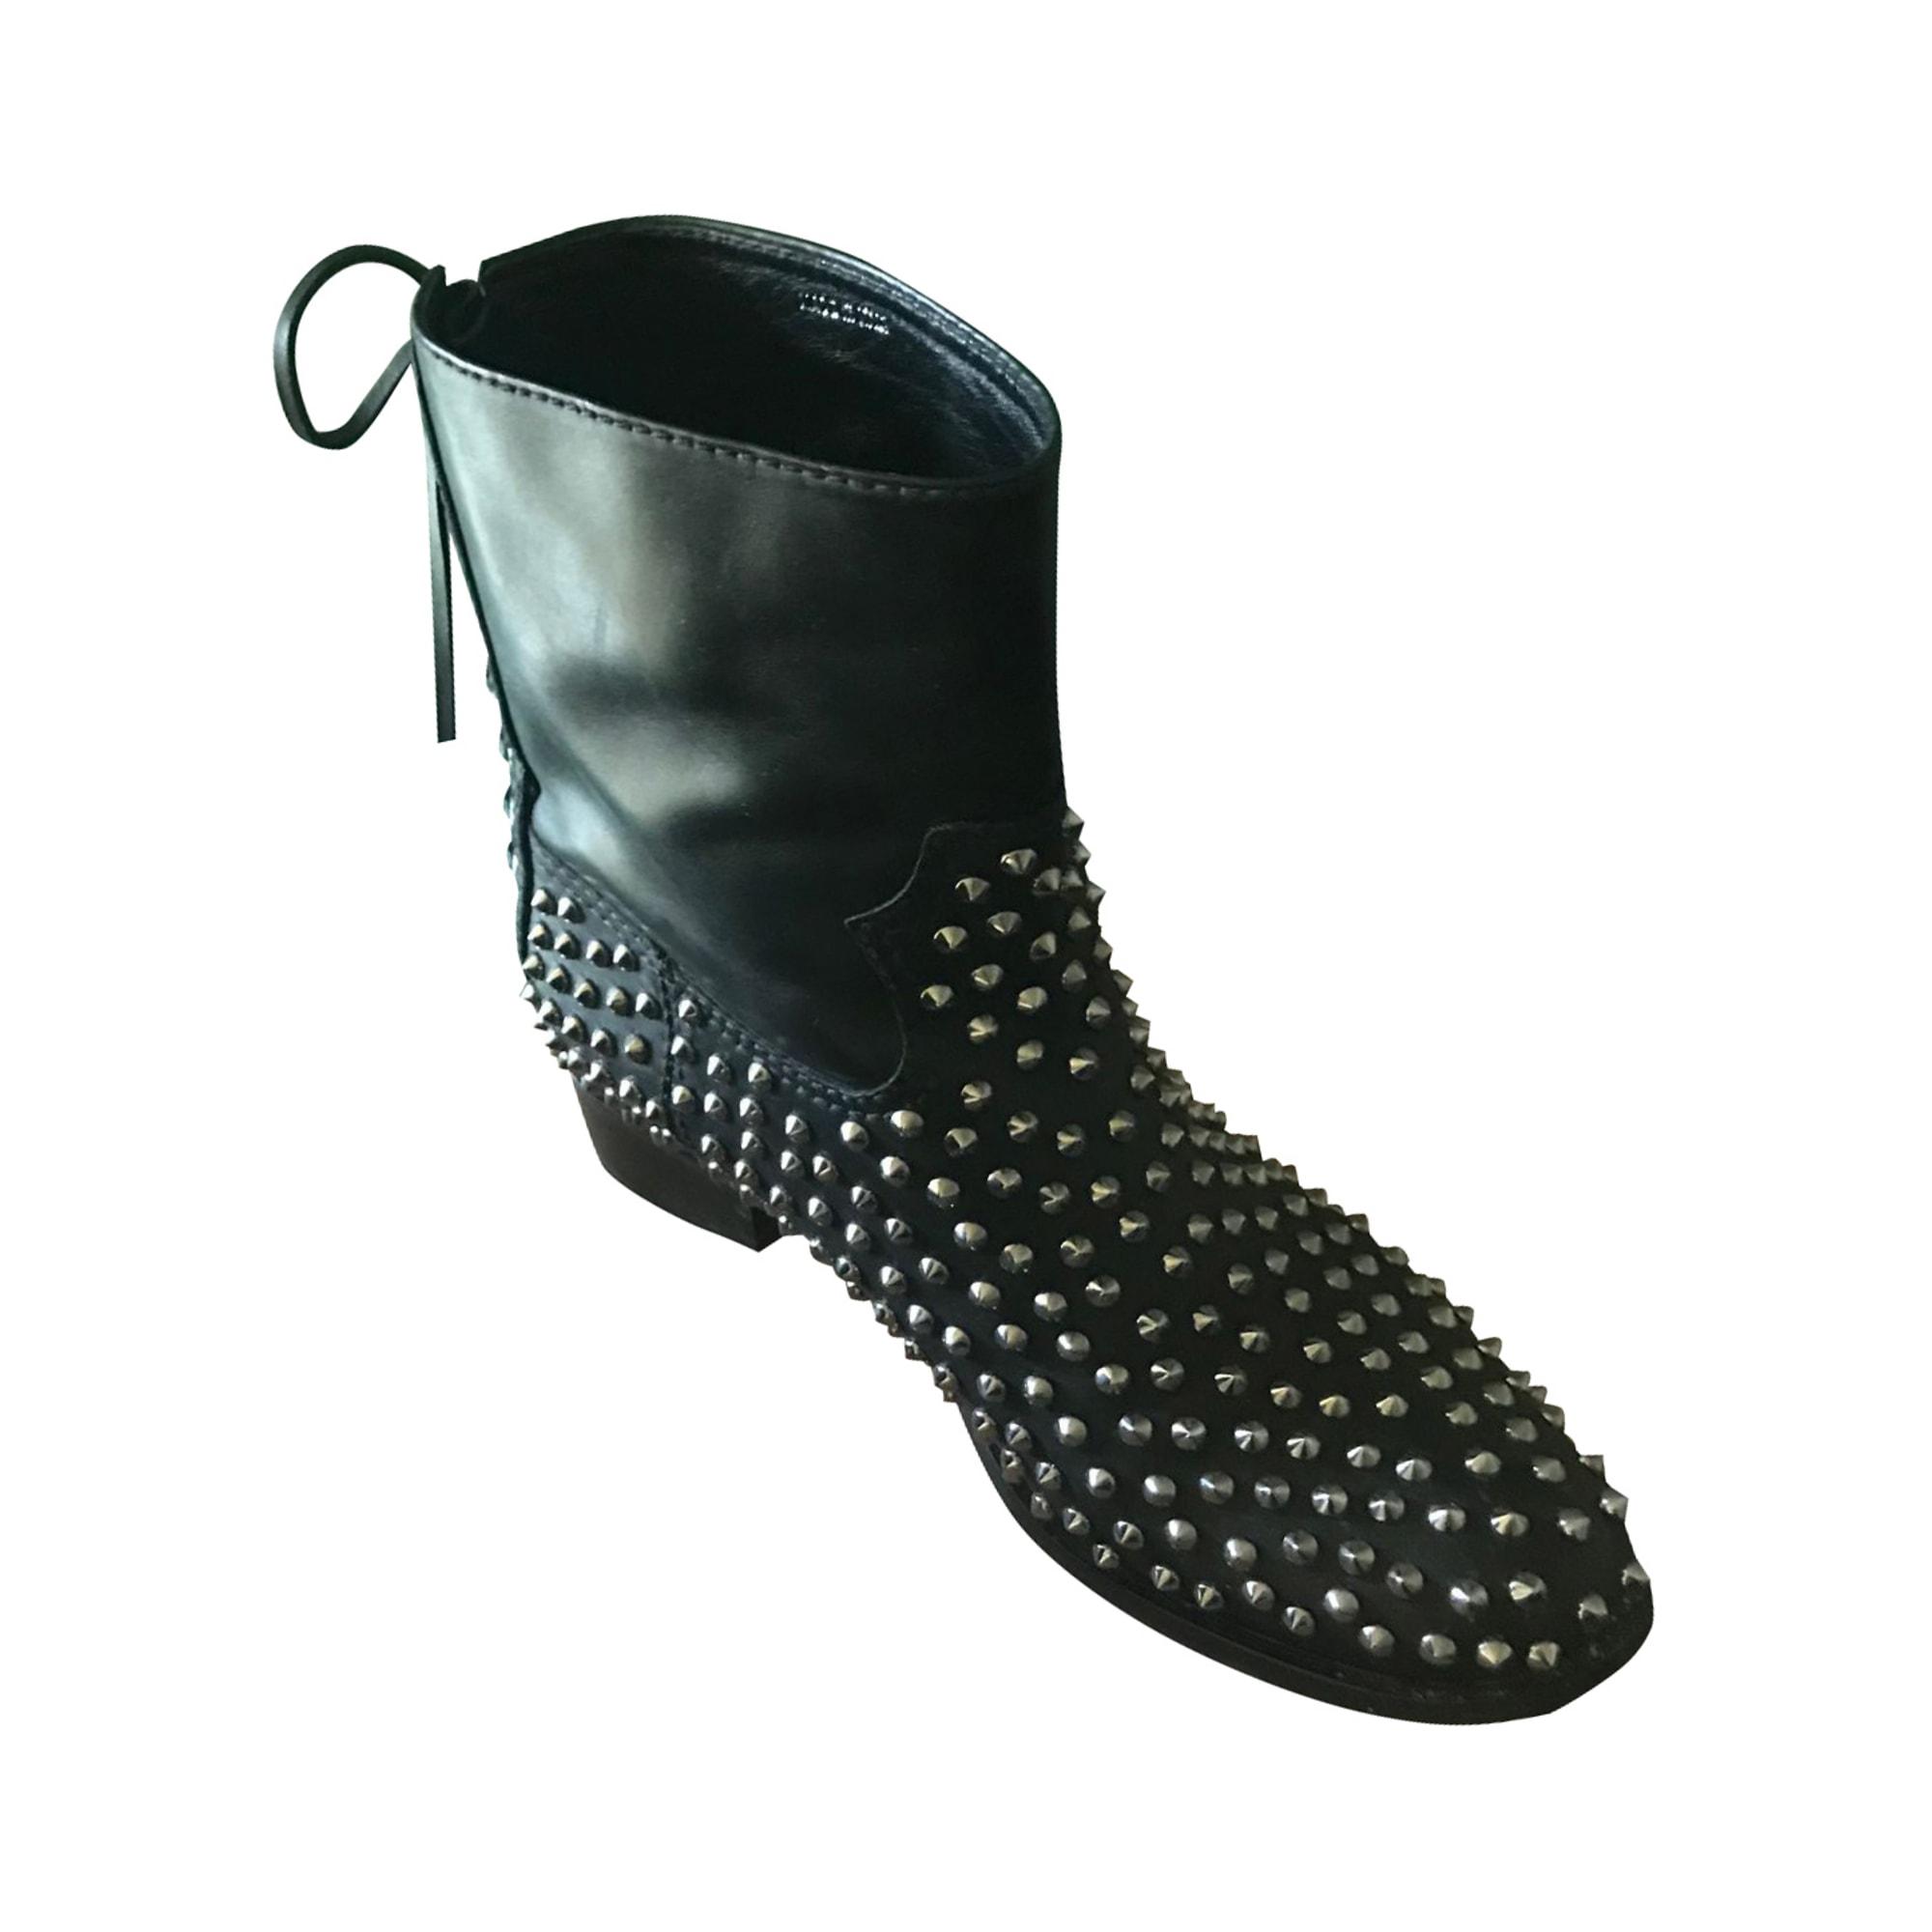 Bottines & low boots plates MIU MIU Noir